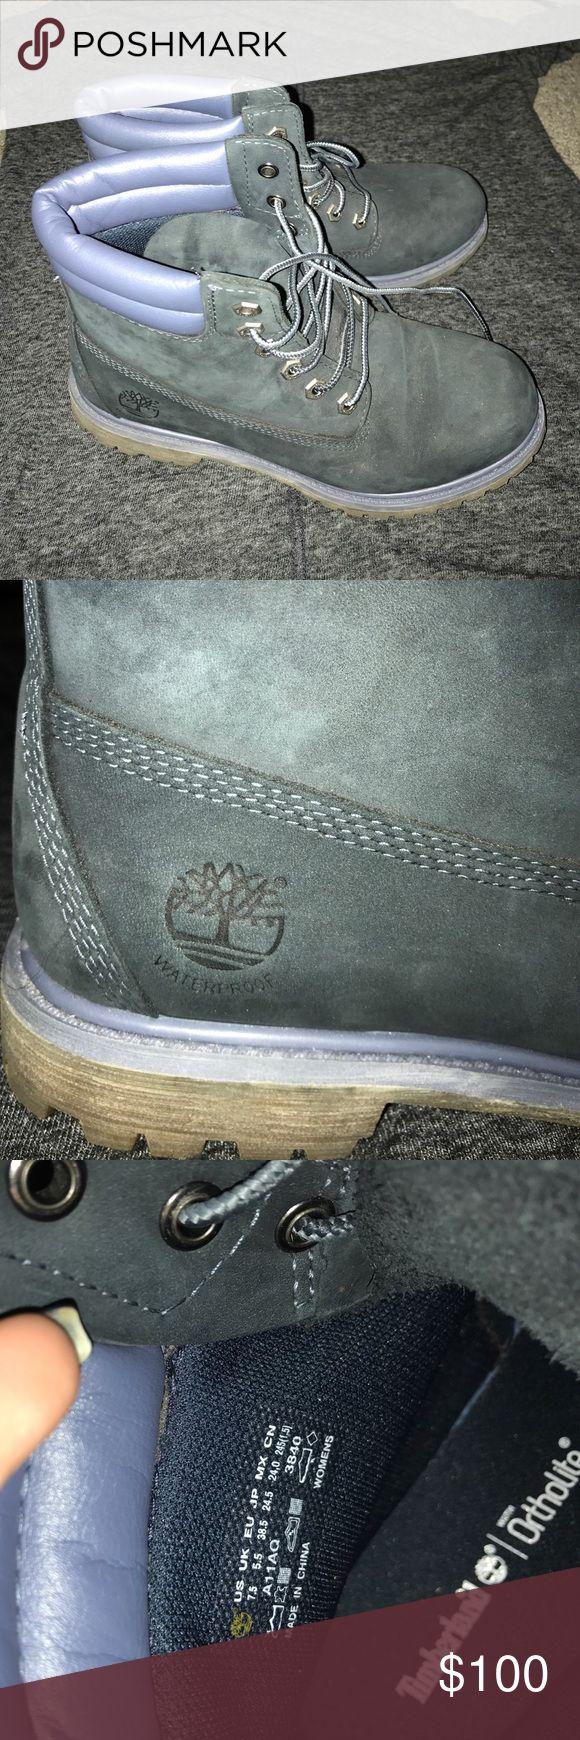 New navy blue timberland boots Brand new! Worn once! Navy blue timberland boots size 7.5 Timberland Shoes Combat & Moto Boots